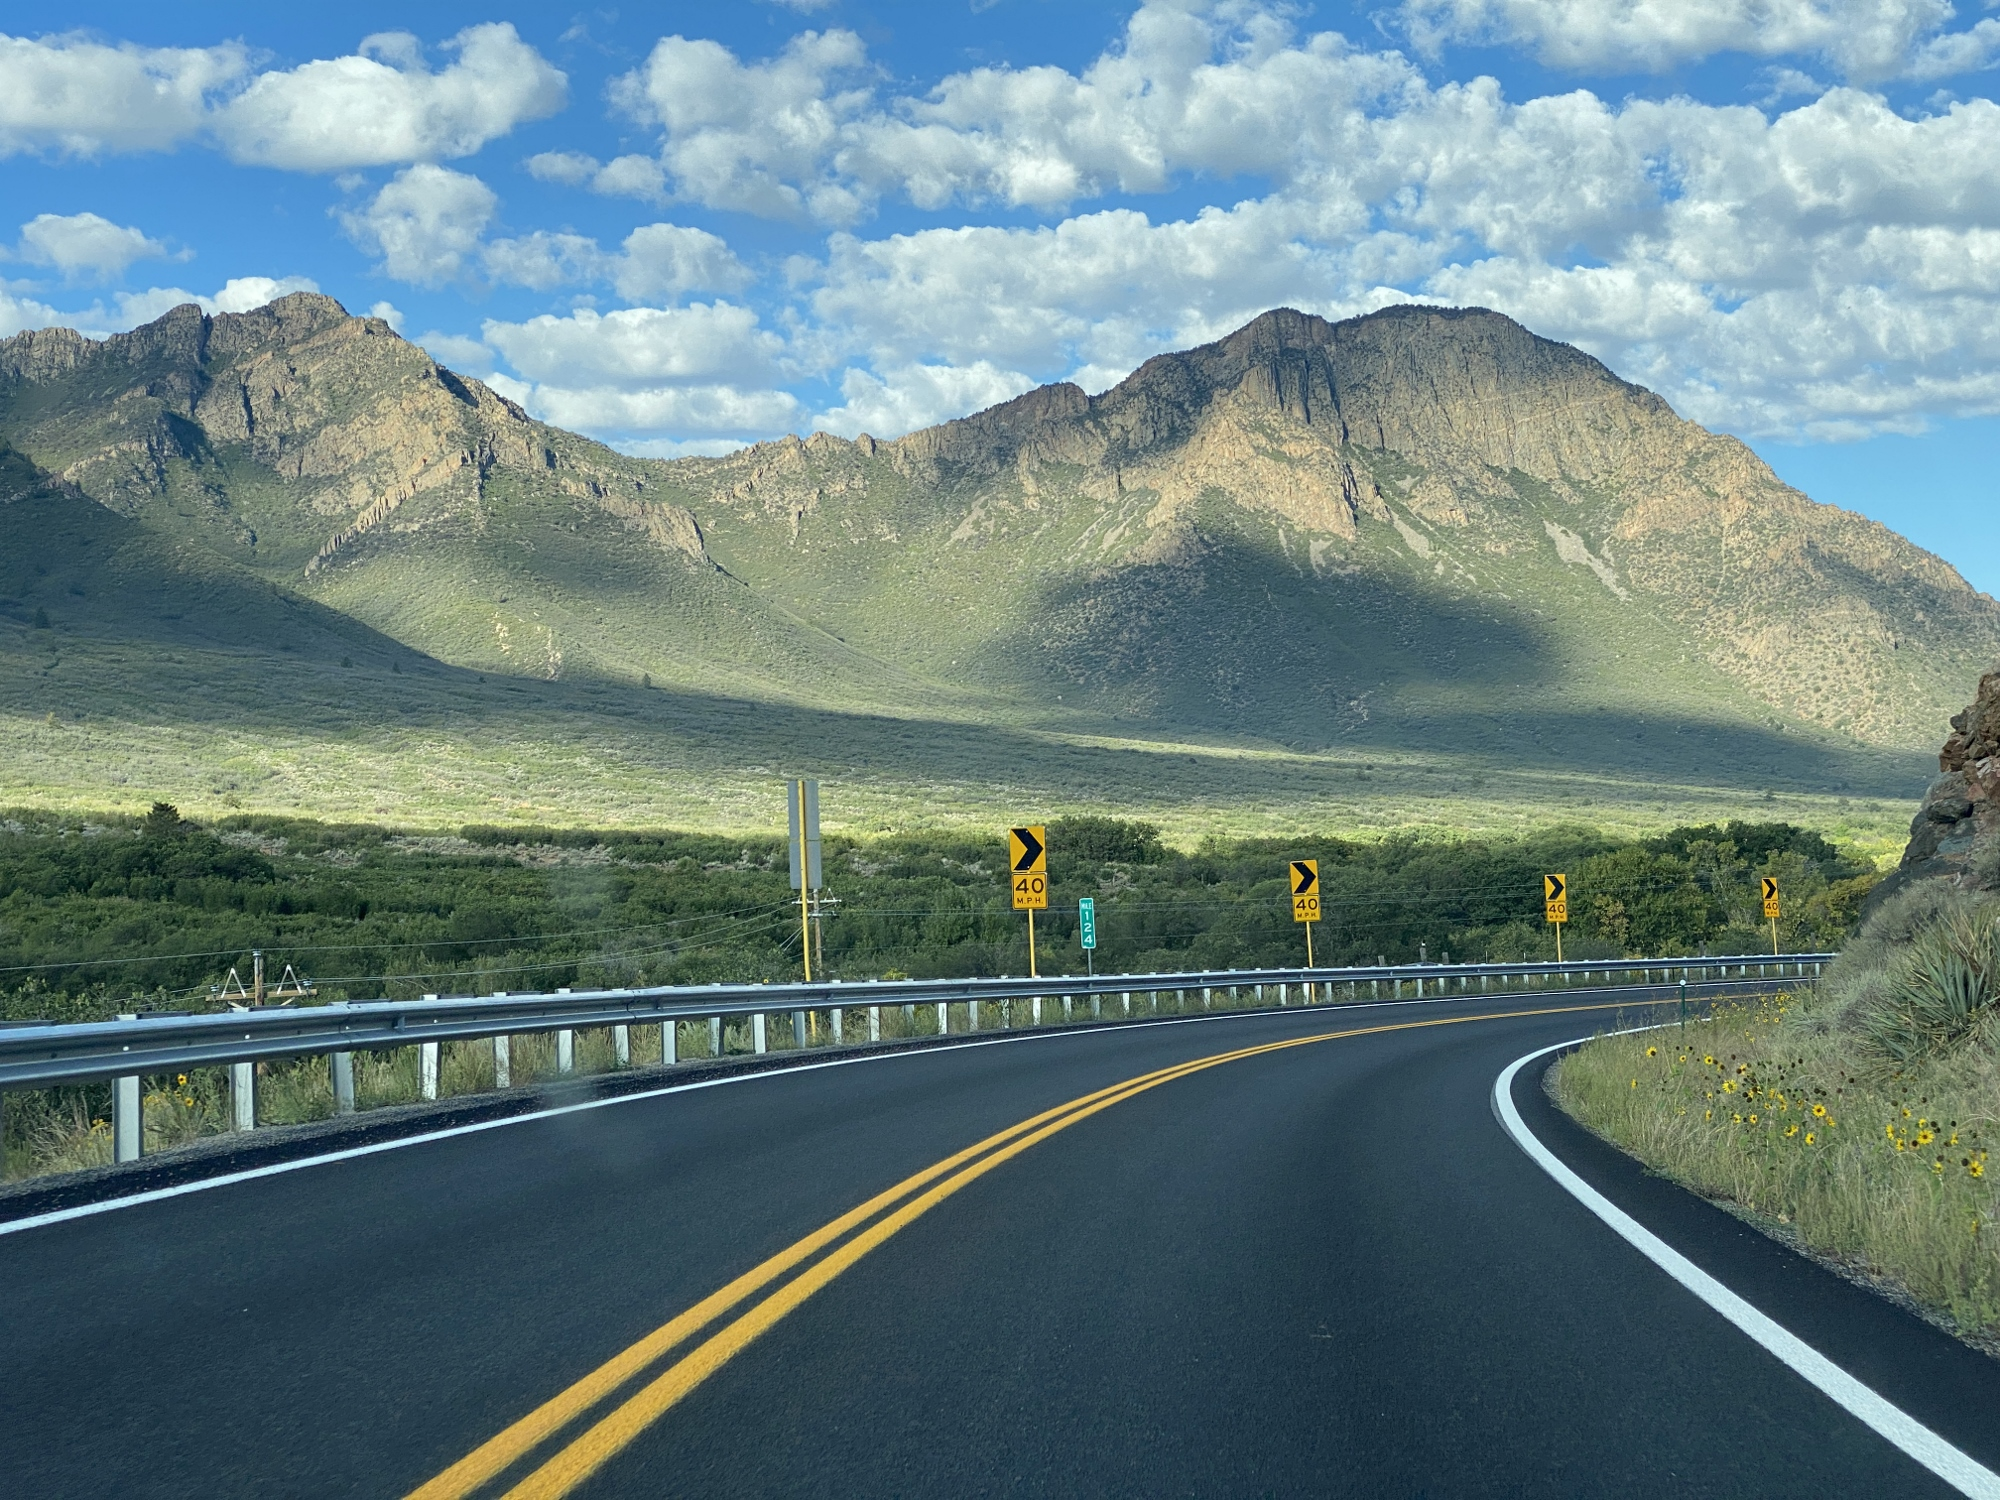 Colorado Highway 141 Between Grand Junction and Cortez